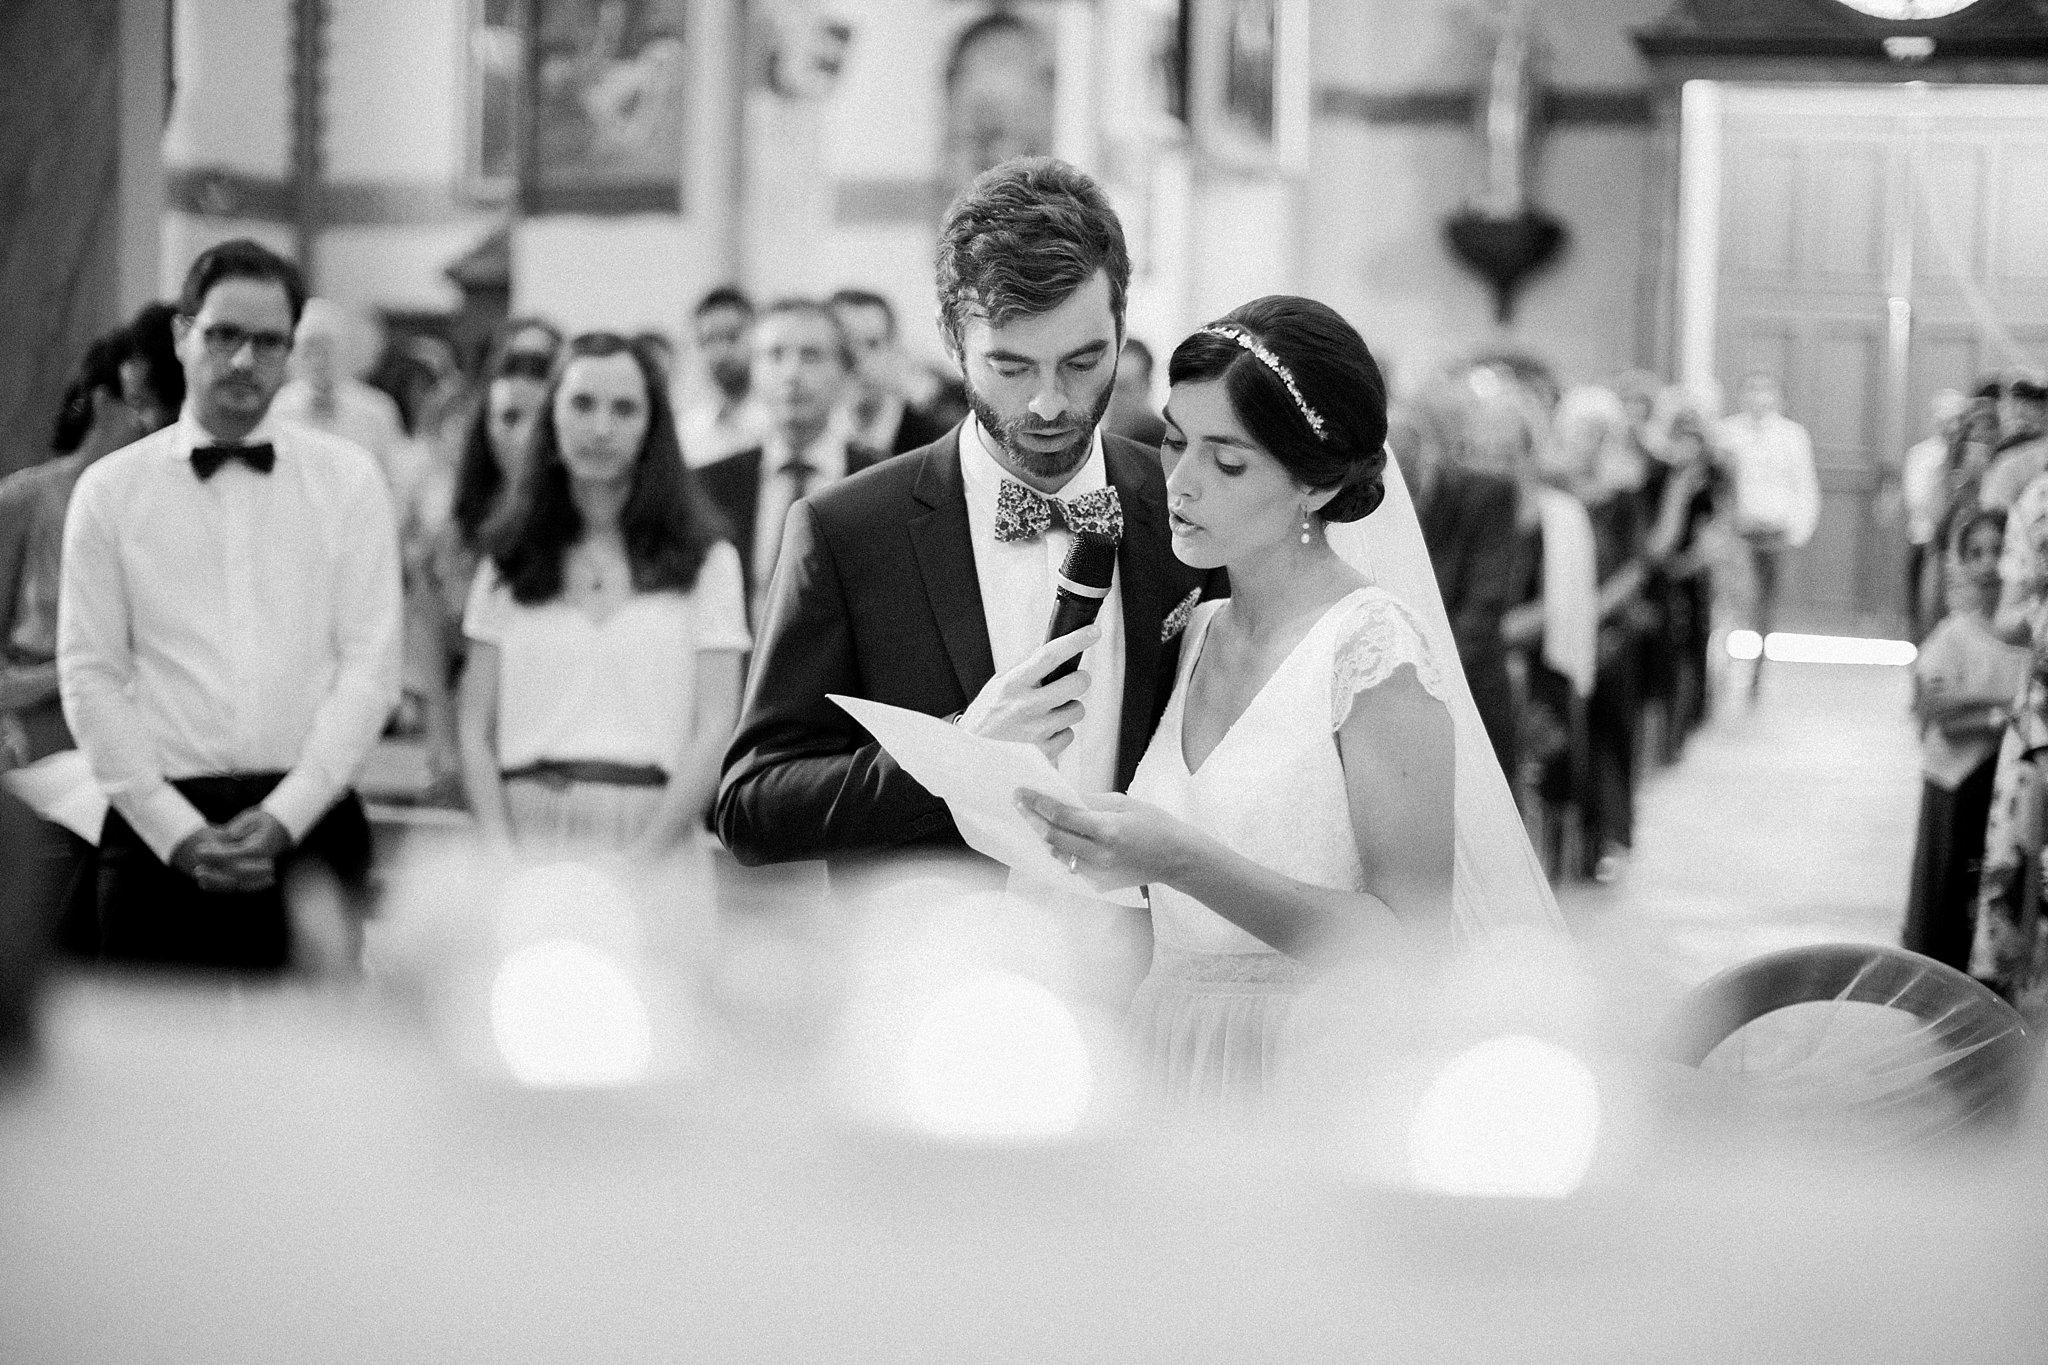 Mariage-a-la-maison-secall-hugo-hennequin-photographe-mariage-perpignan_0087.jpg